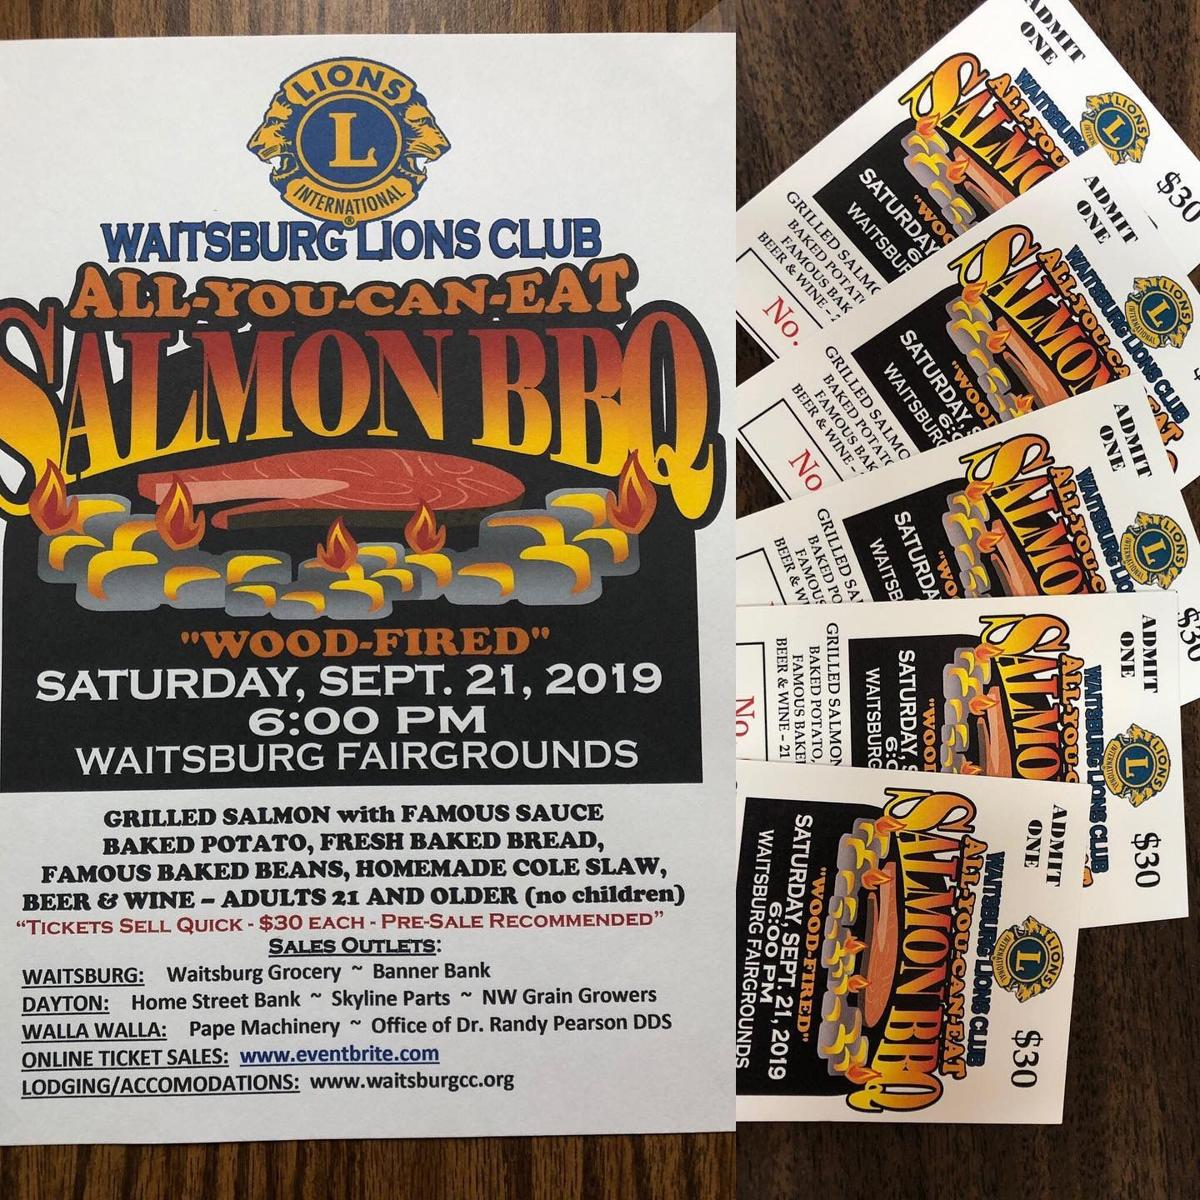 Waitsburg Lions' Salmon BBQ